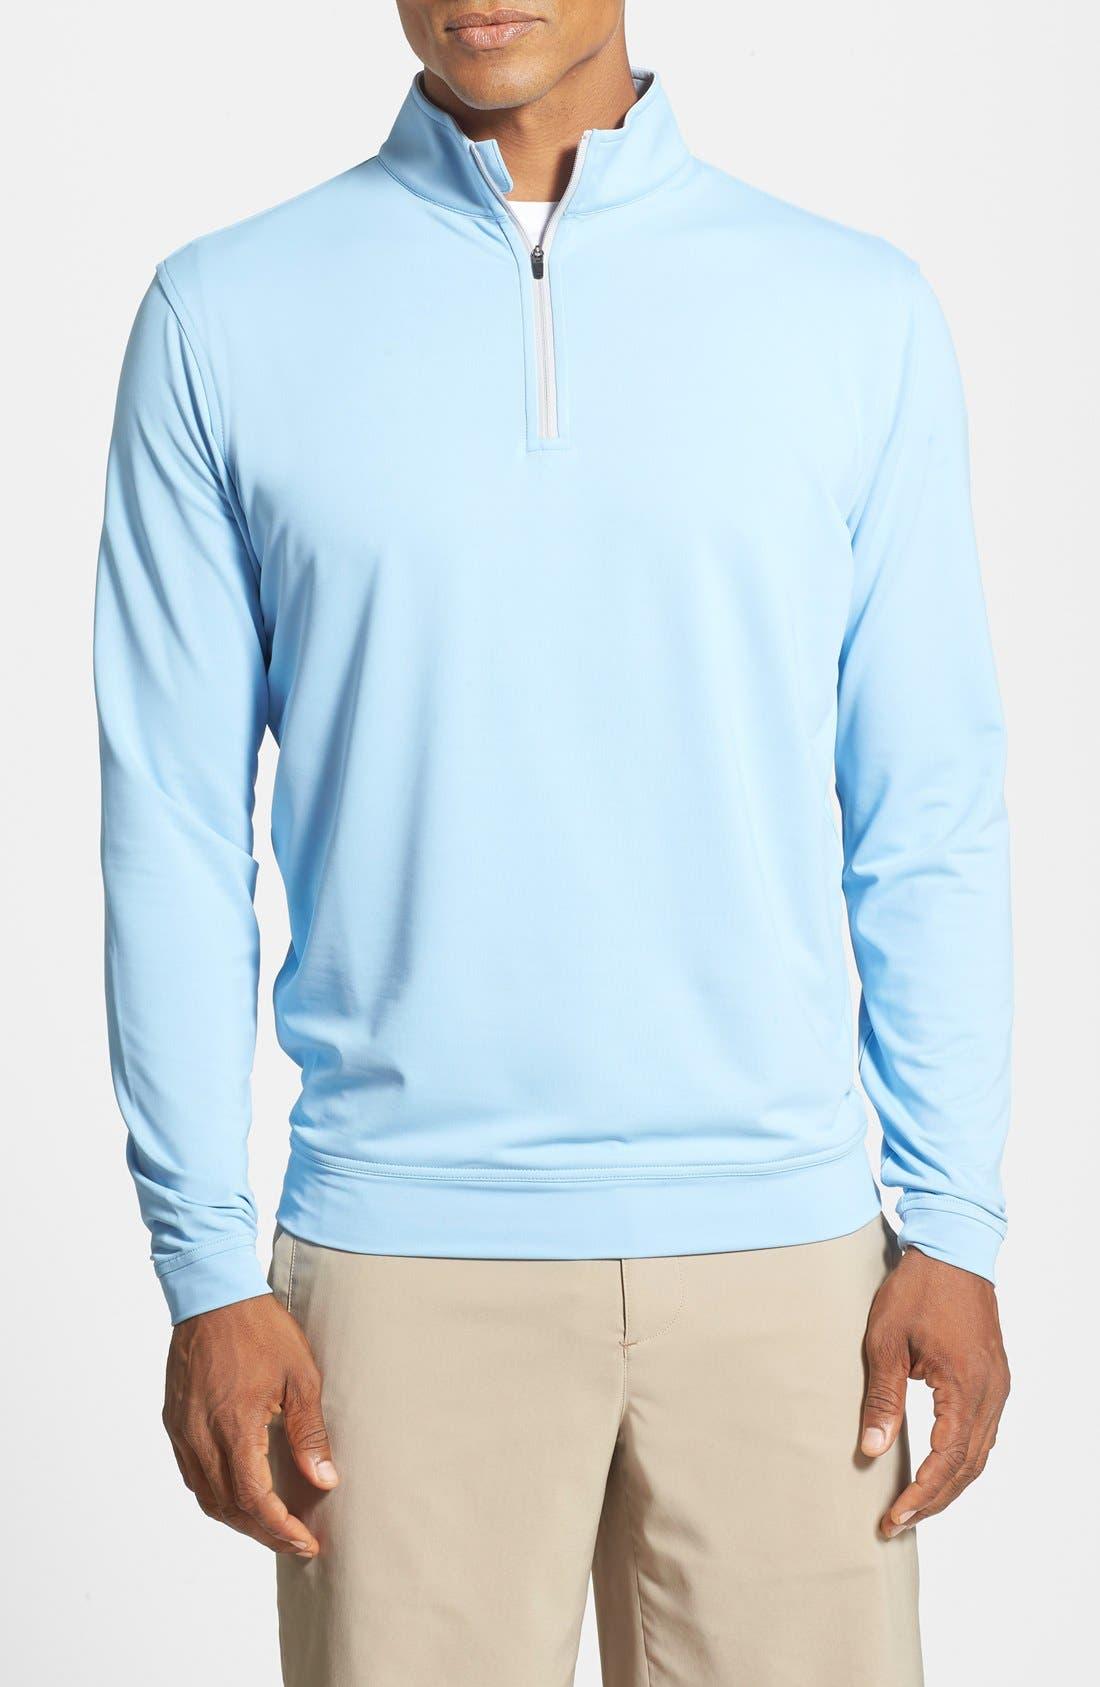 'Perth' Quarter Zip Pullover,                             Main thumbnail 1, color,                             COTTAGE BLUE